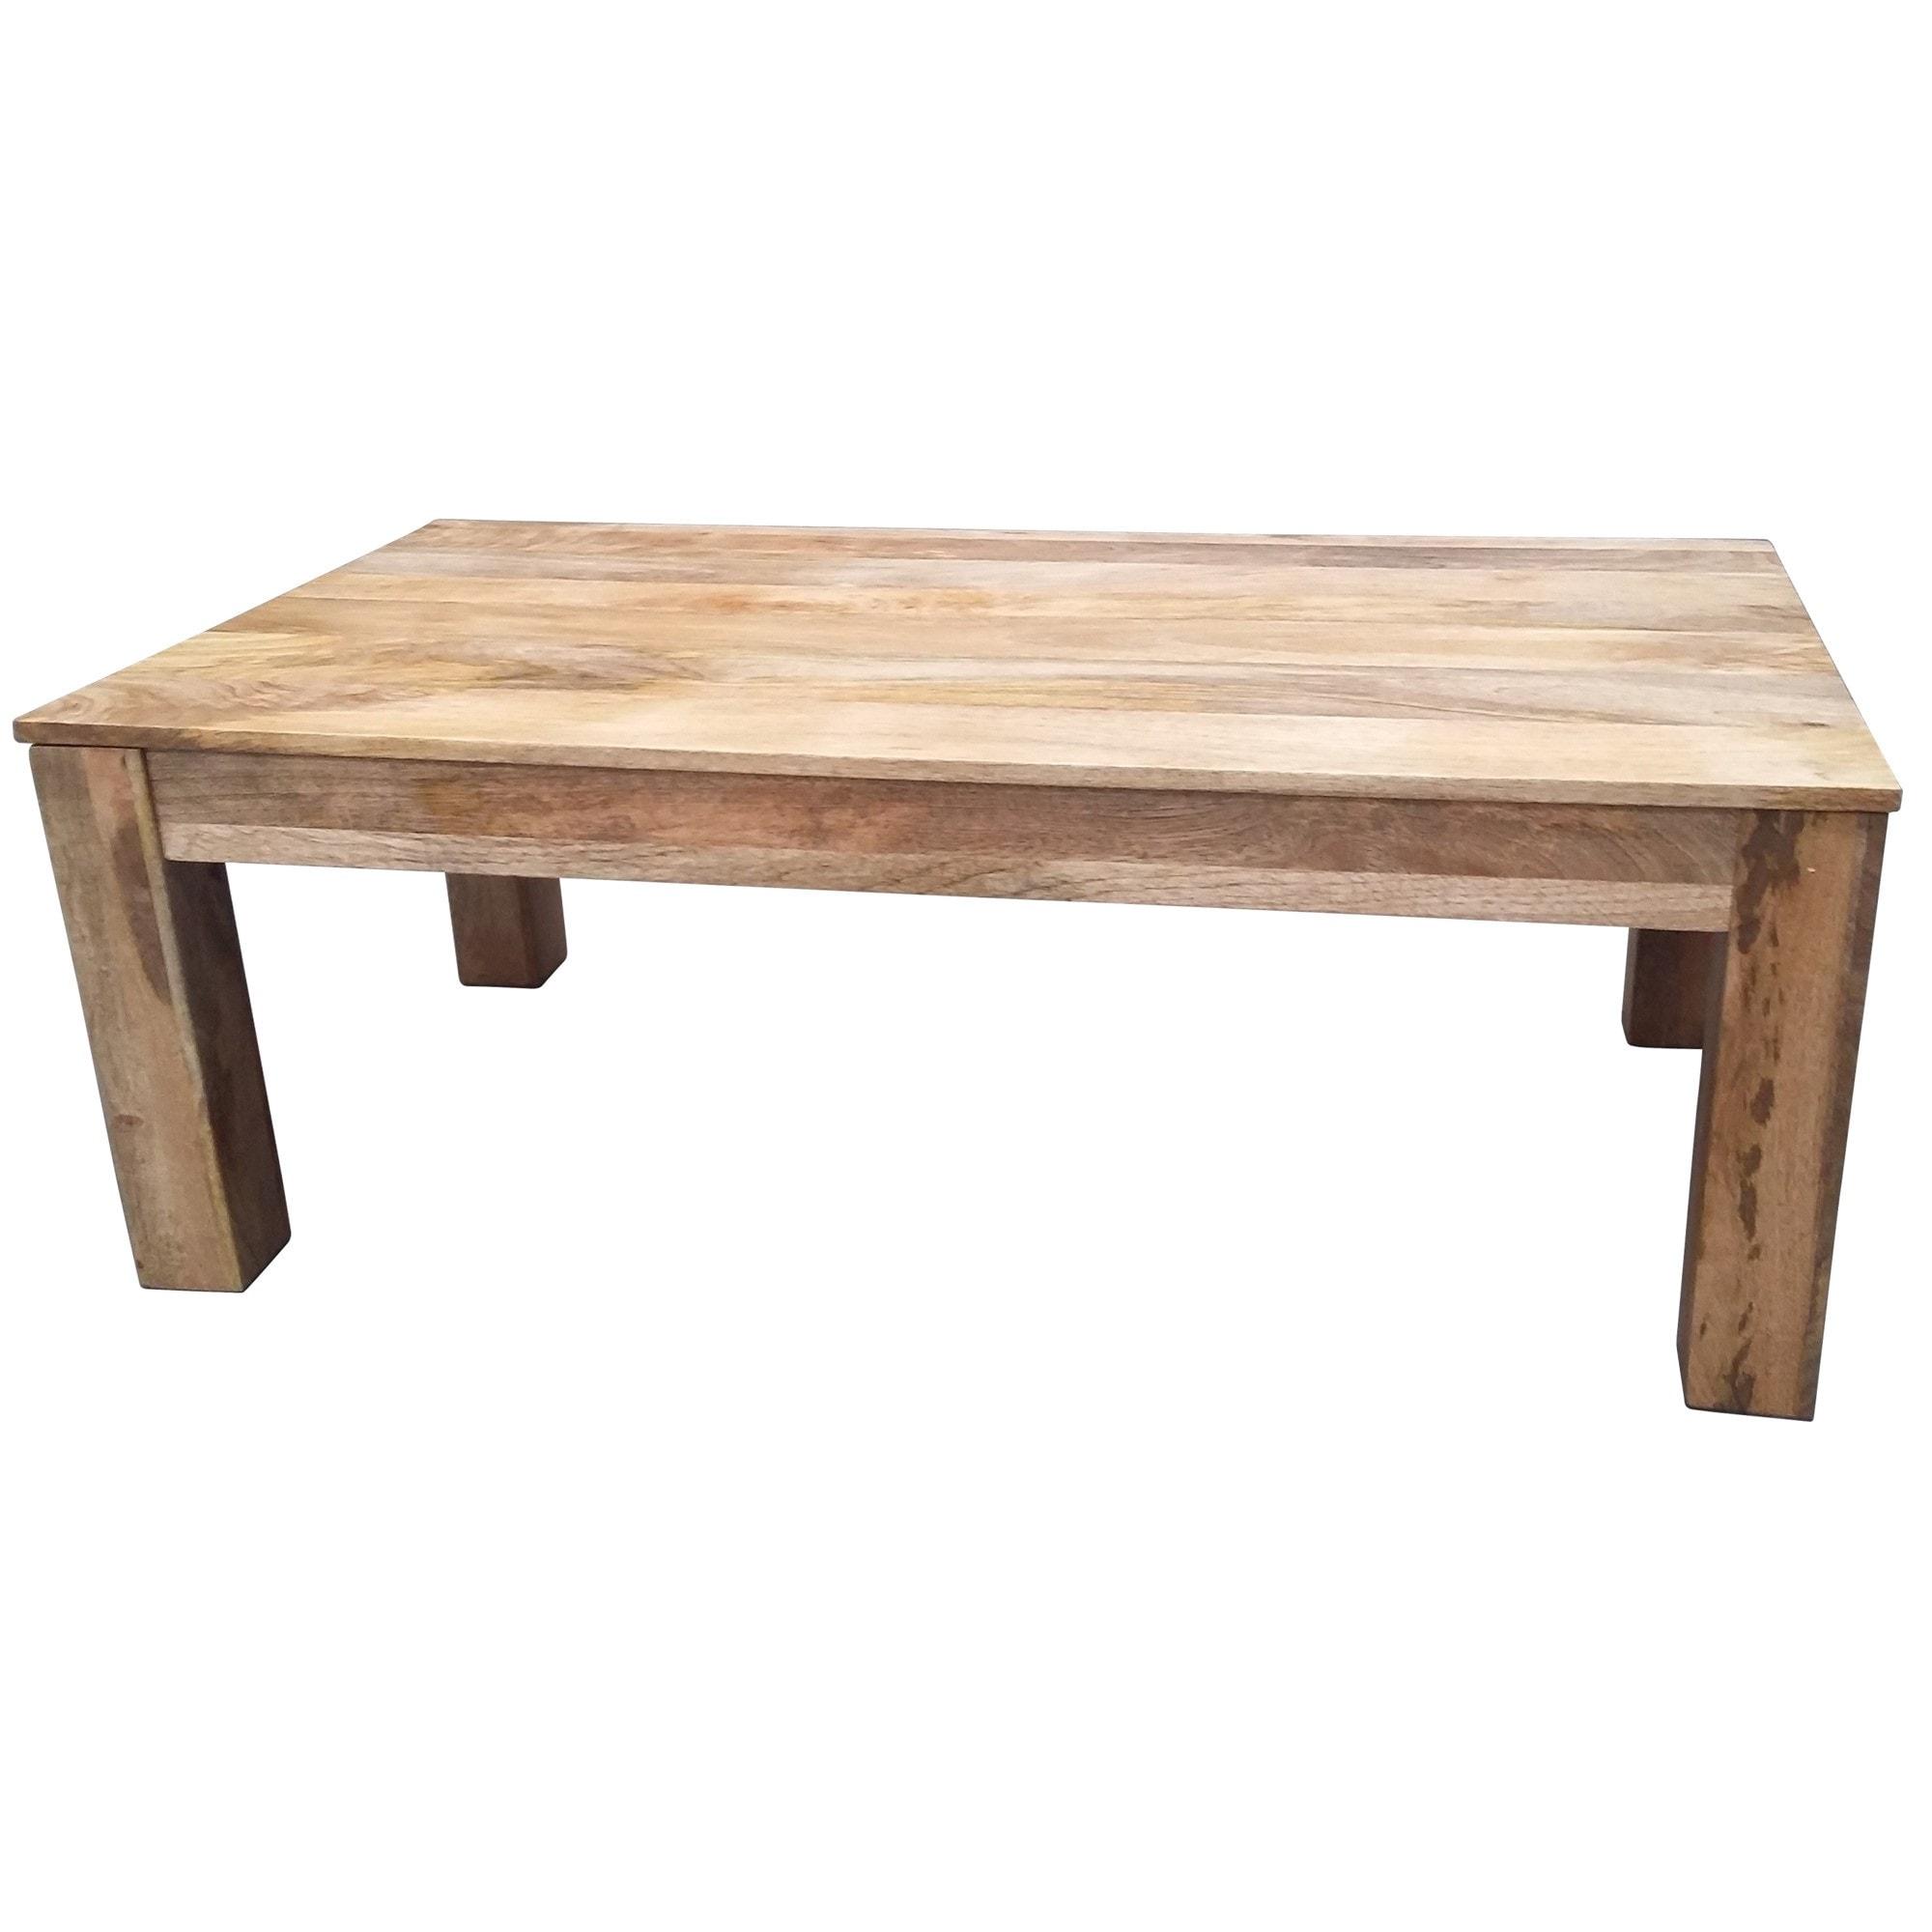 Dakota Large Coffee Table Light Wooden Coffee Table Wooden Coffee Table